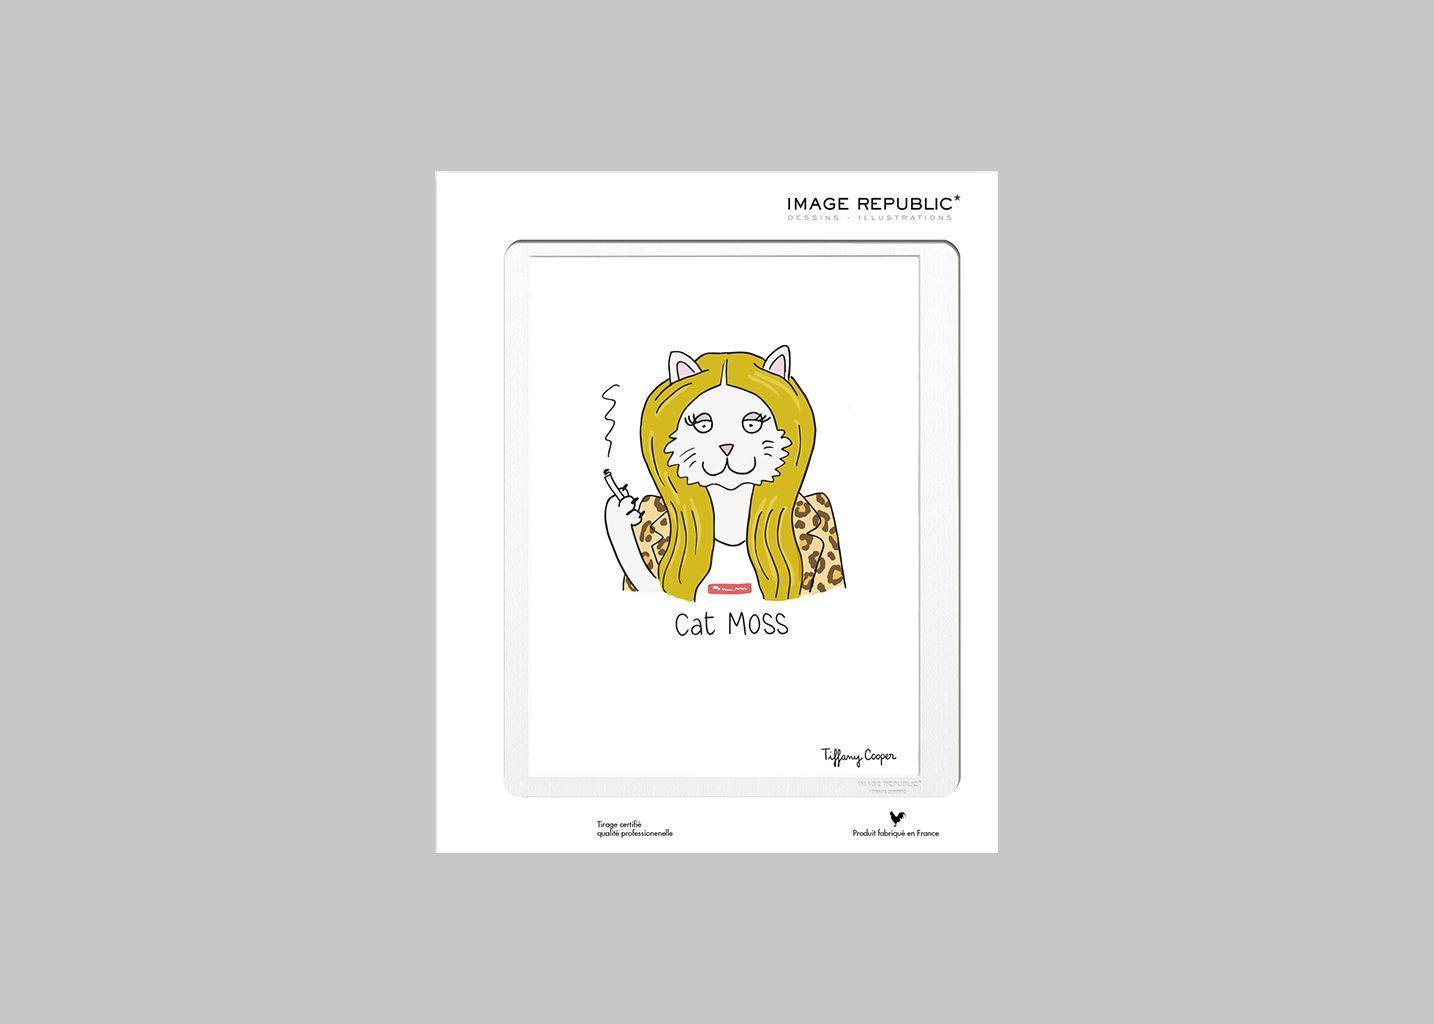 Affiche Cat Moss - Image Republic